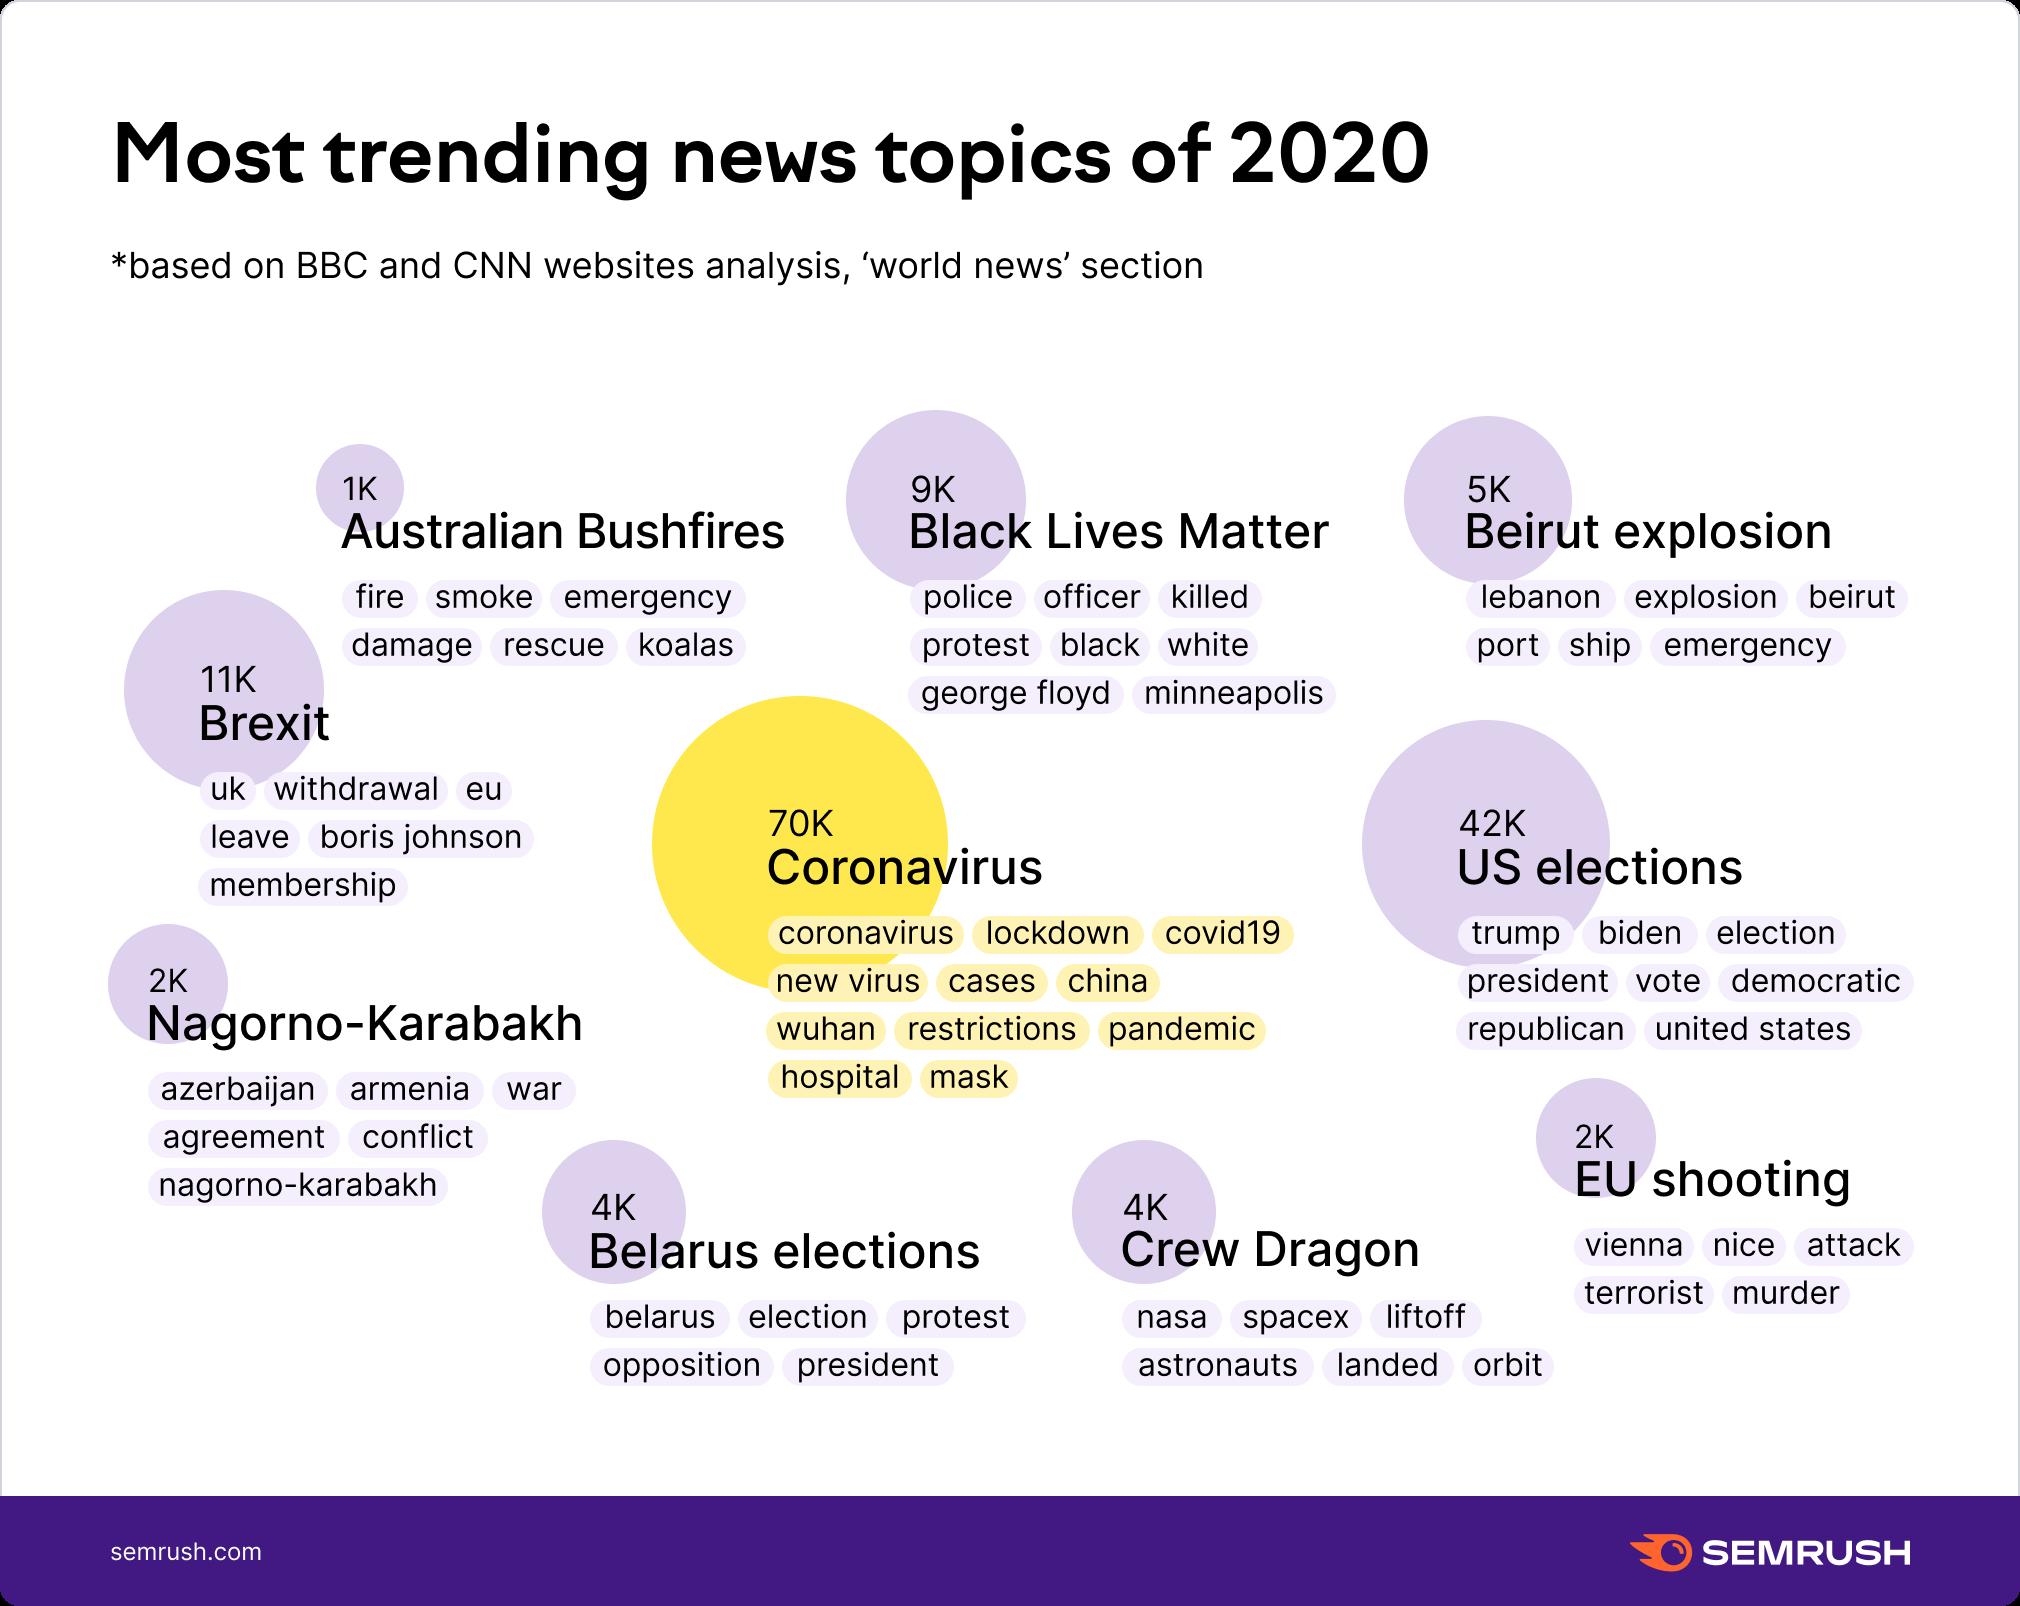 Most trending news topics of 2020